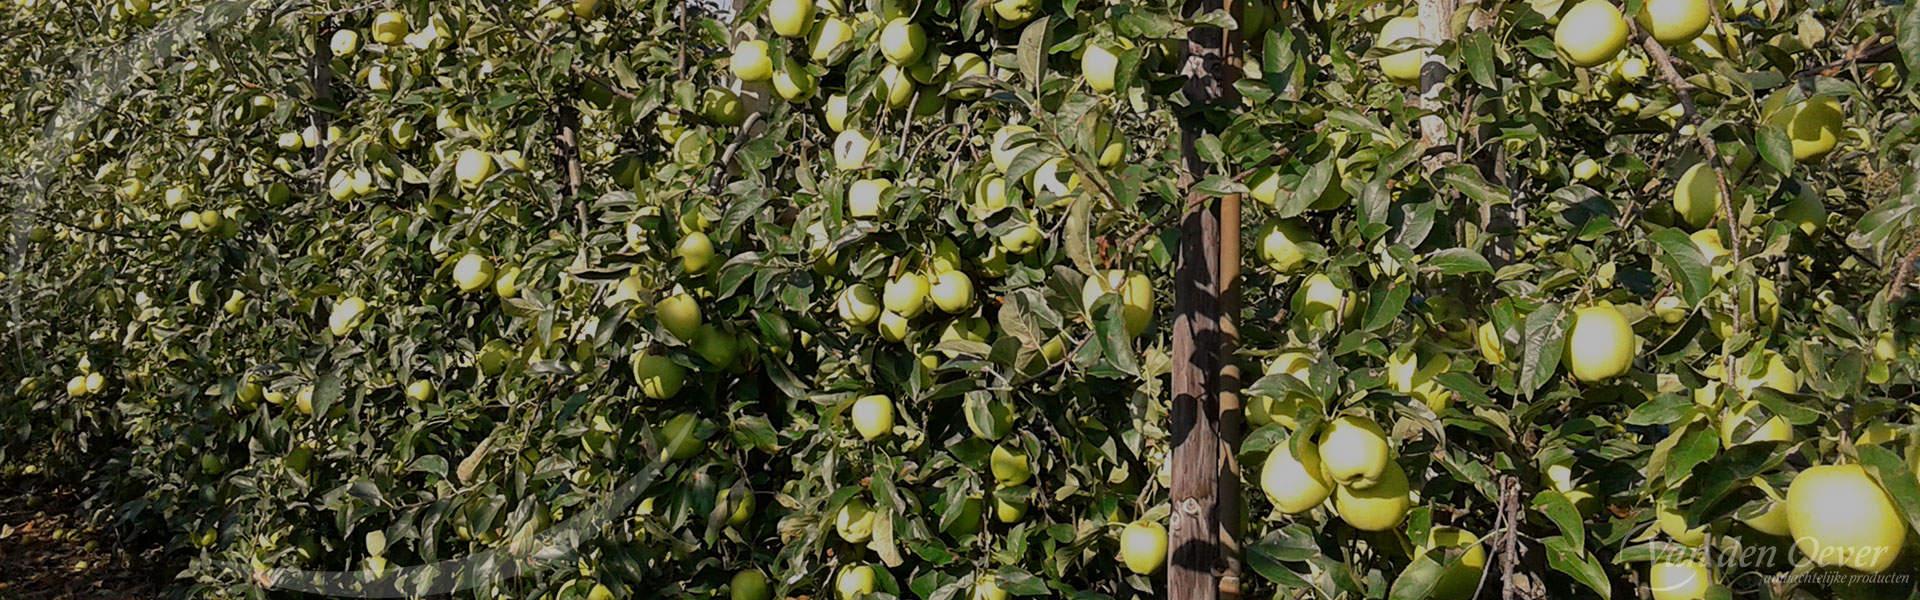 fruitbomen appels